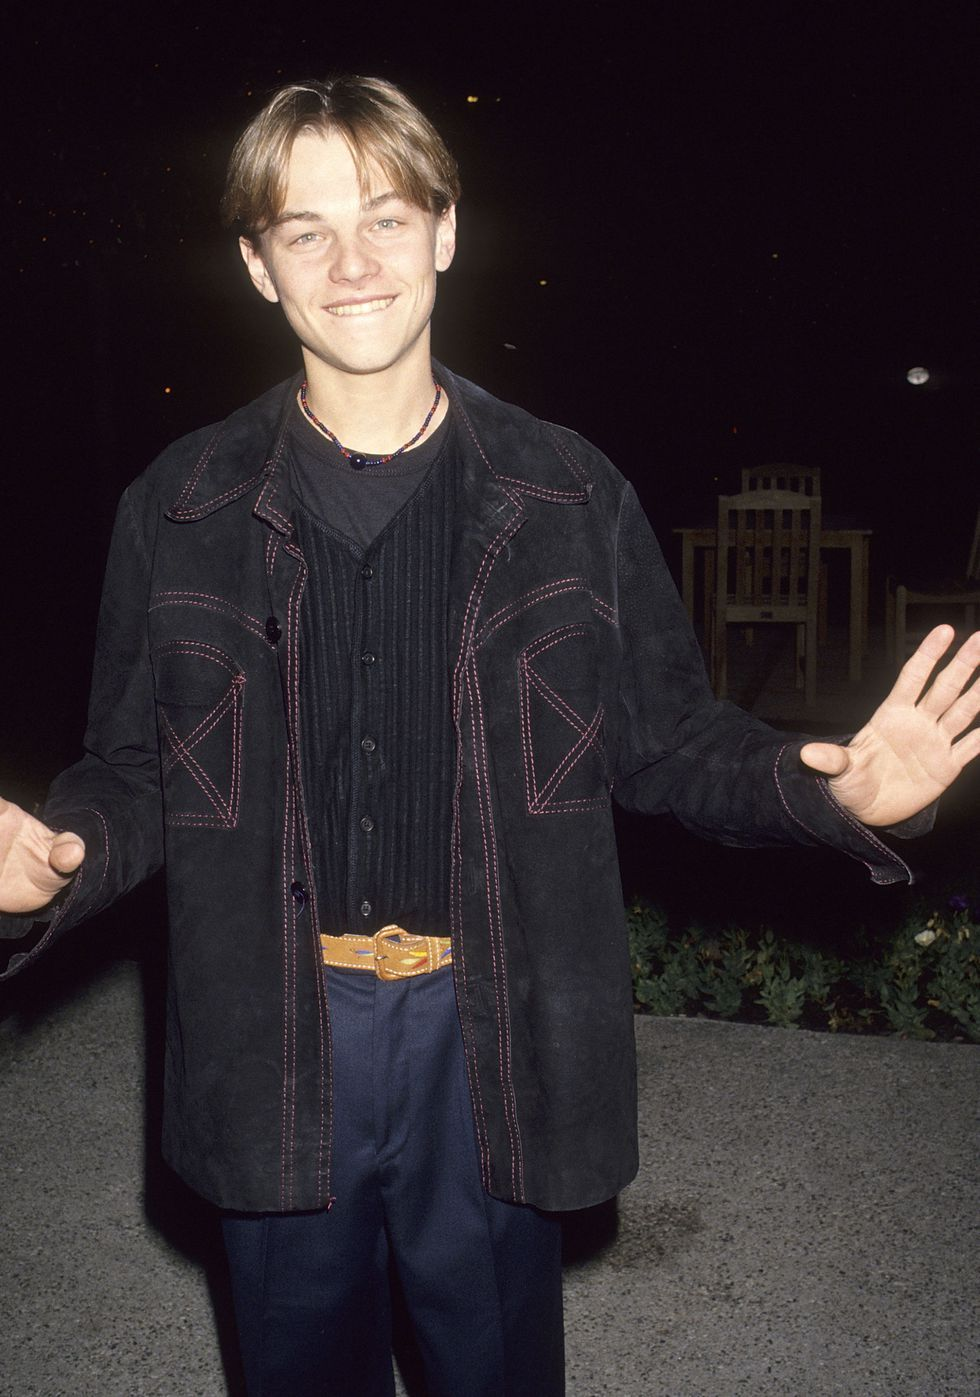 41 Awkward Leonardo DiCaprio Faces to Love #vintage